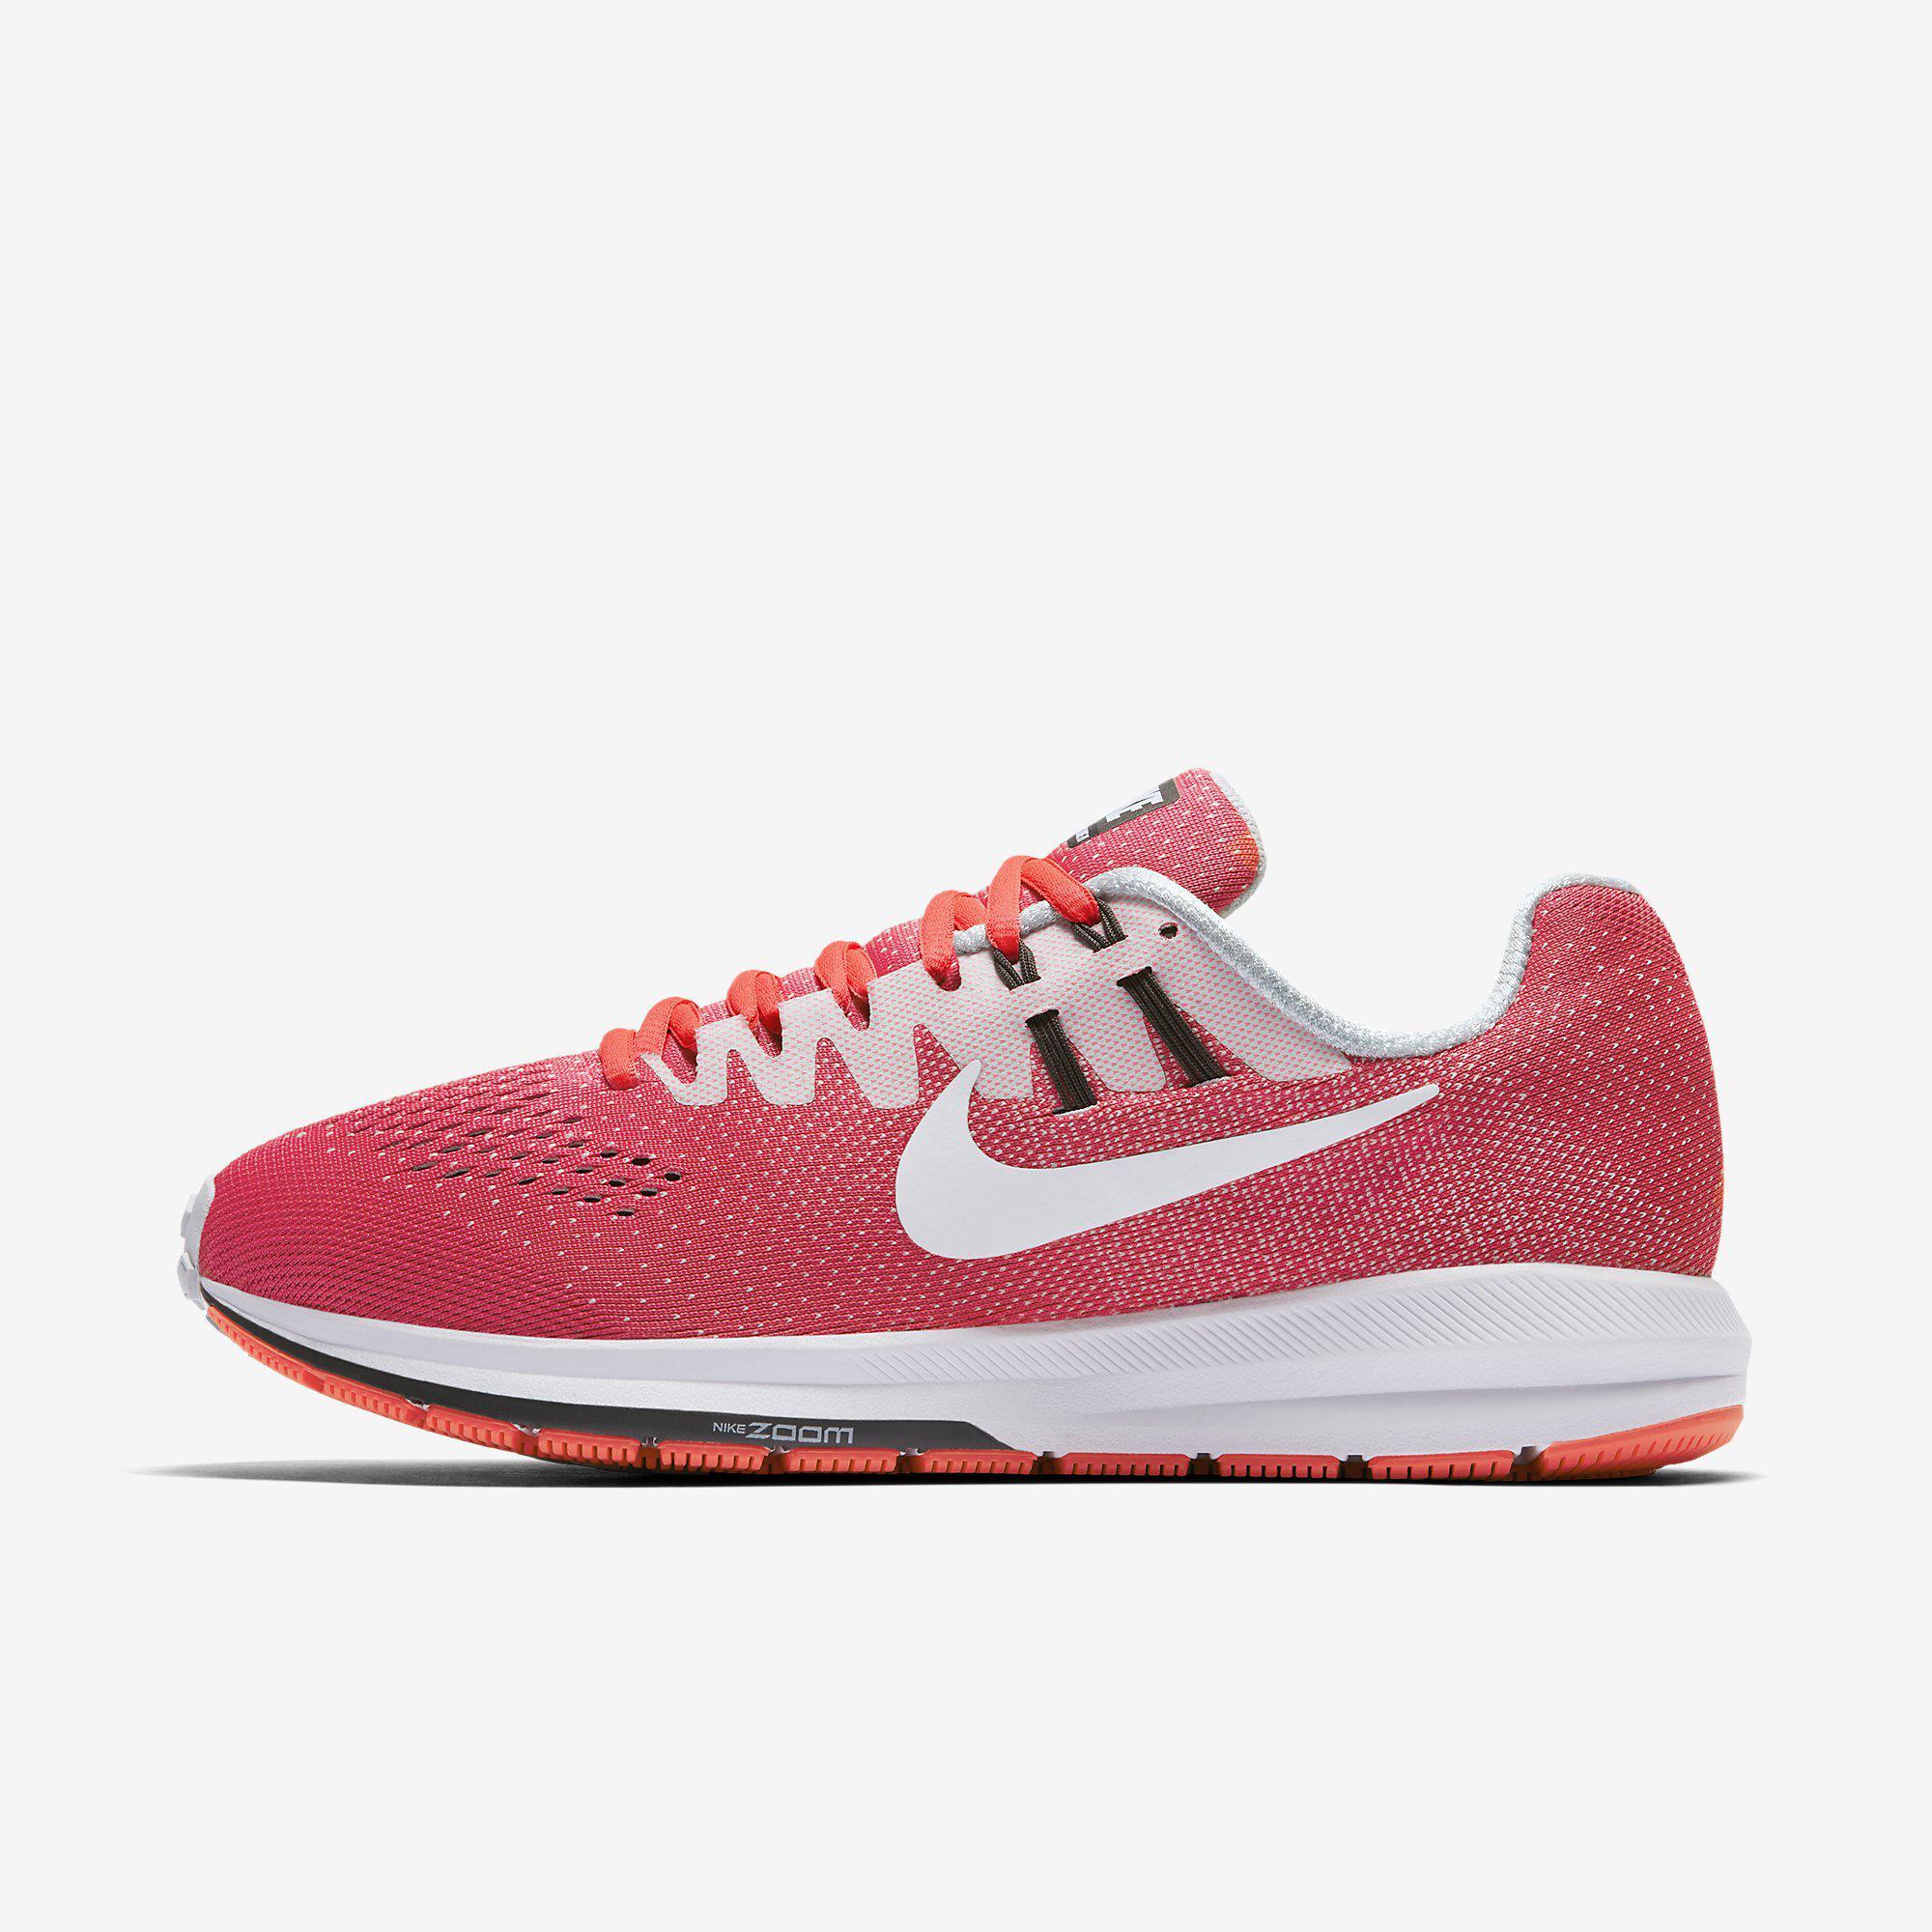 buy popular d9ffa 668c5 Nike Womens Air Zoom Structure 20 Running Shoe - Racer Pink - Tennisnuts.com